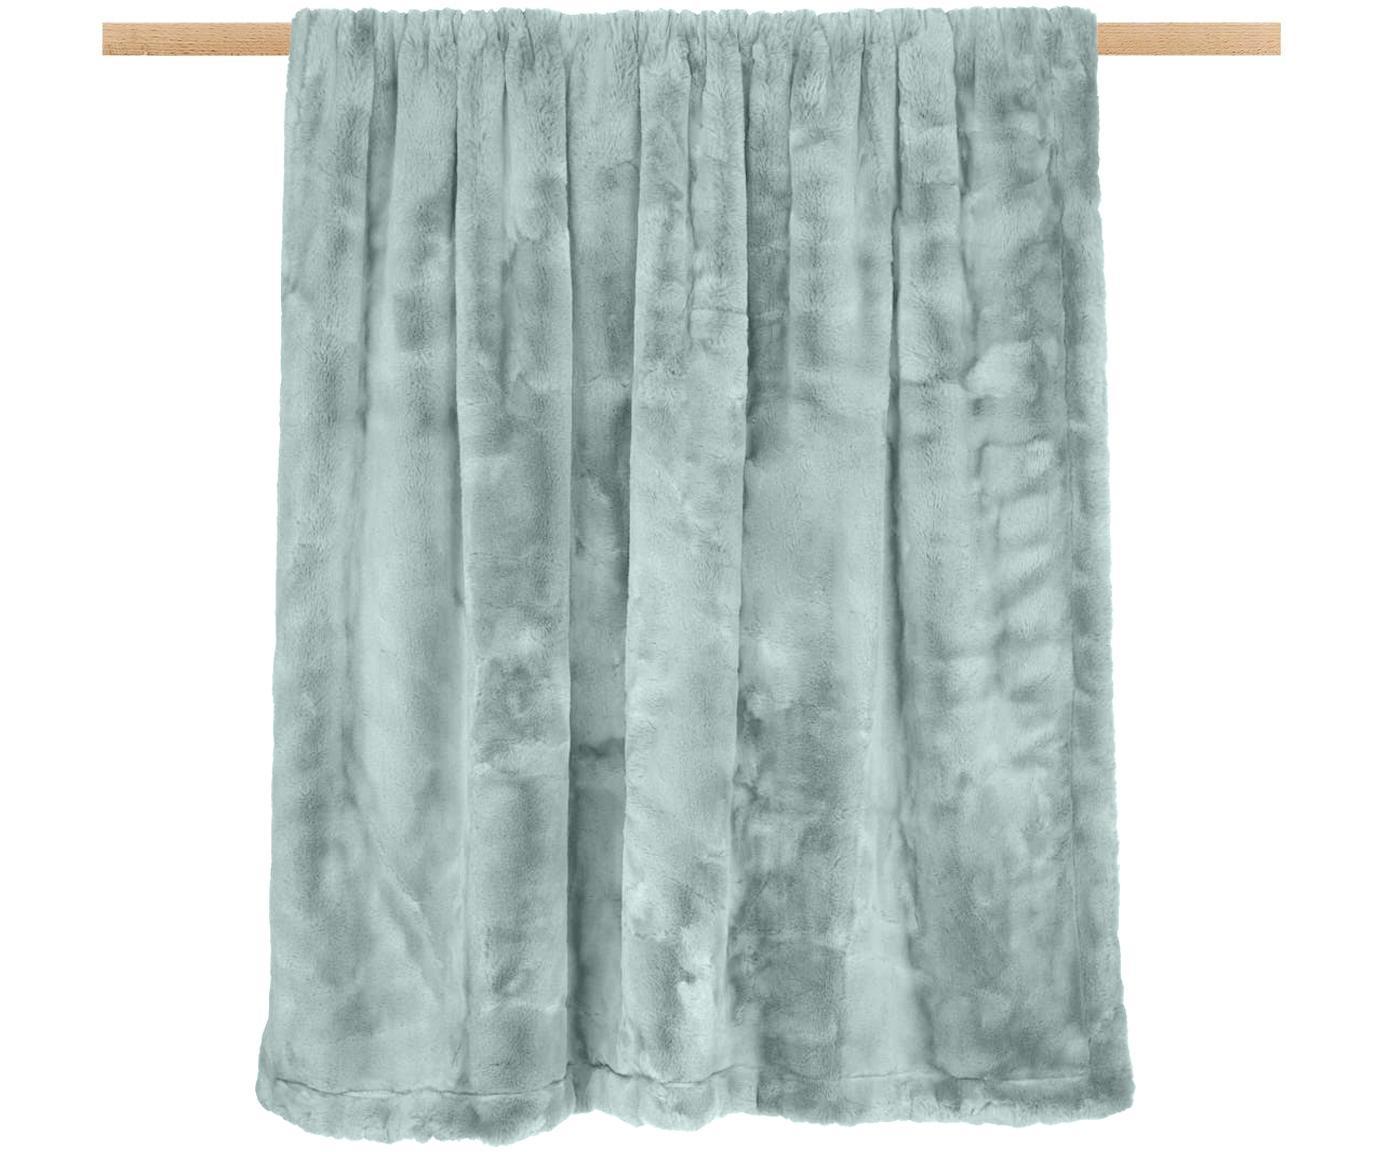 Kunstfell-Plaid Mette, glatt, Vorderseite: 100% Polyester, Rückseite: 100% Polyester, Grün, 150 x 200 cm